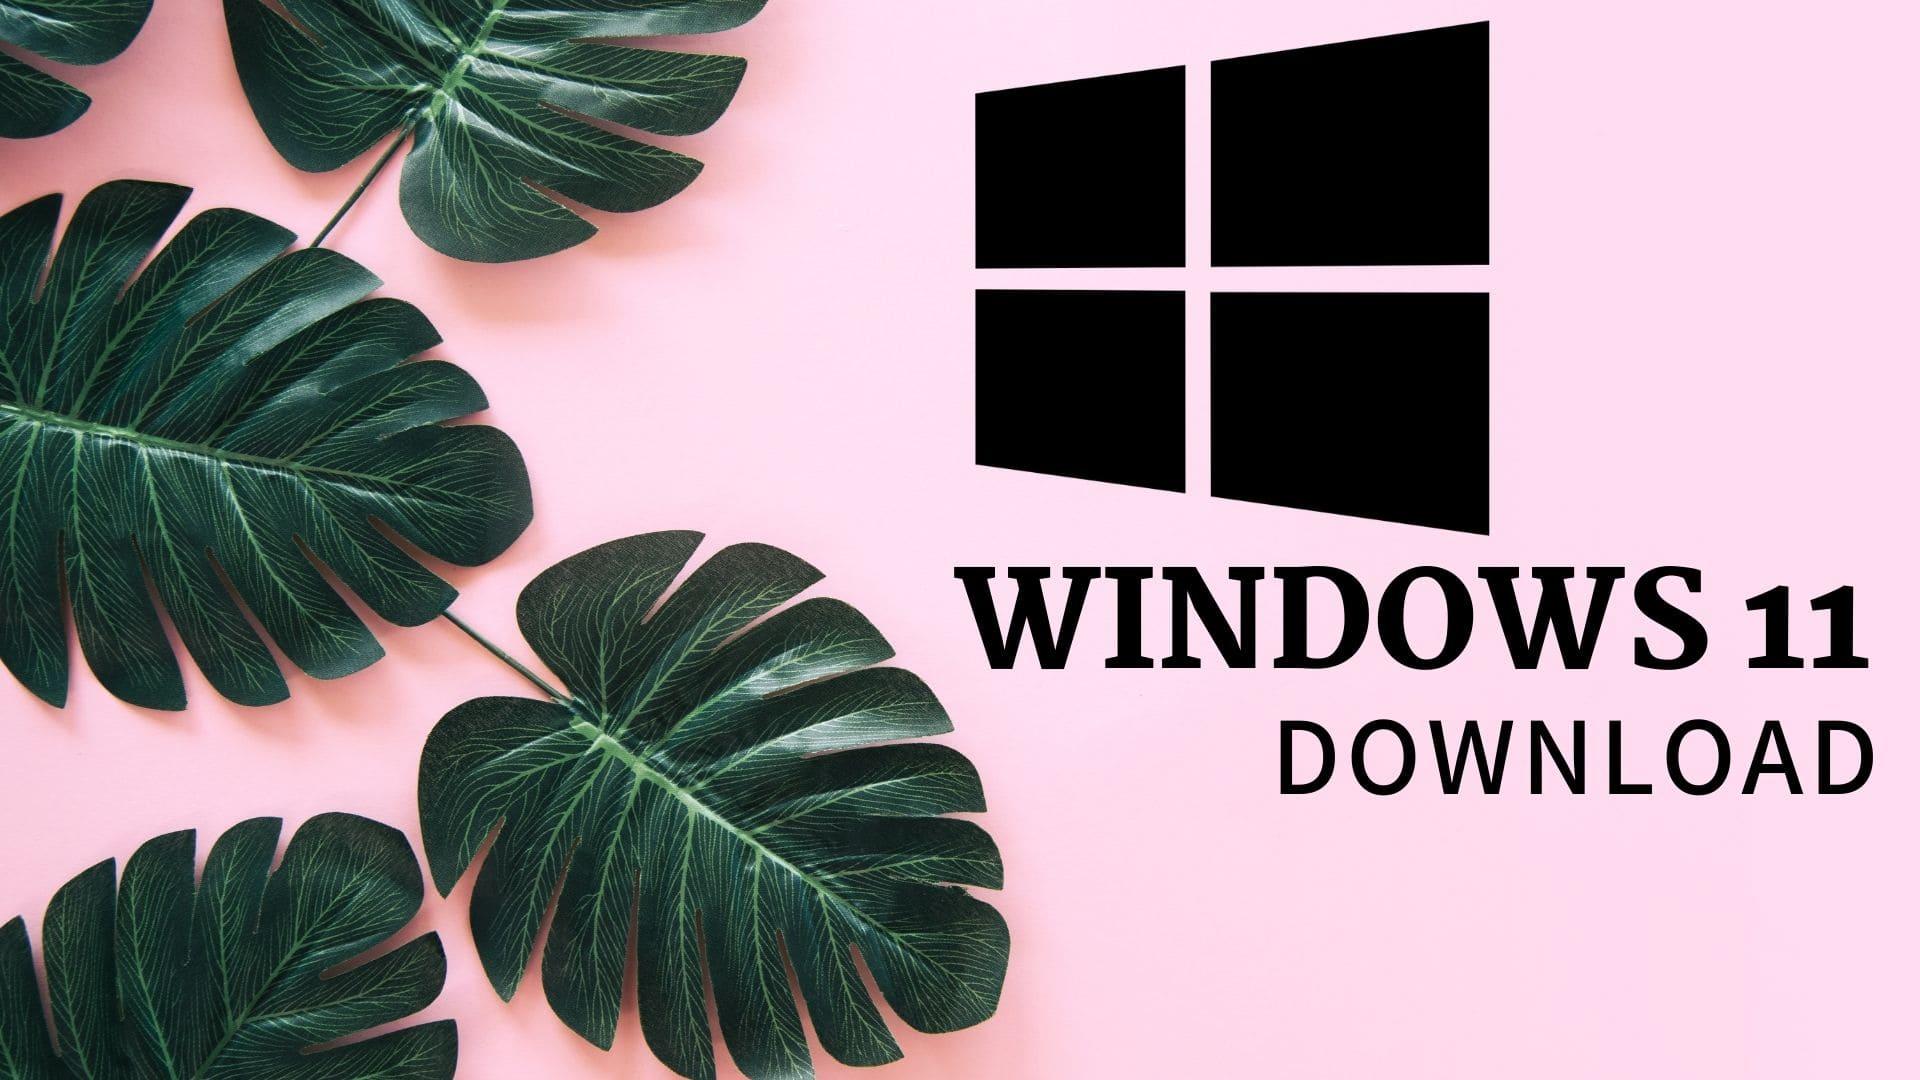 windows 11 release date?